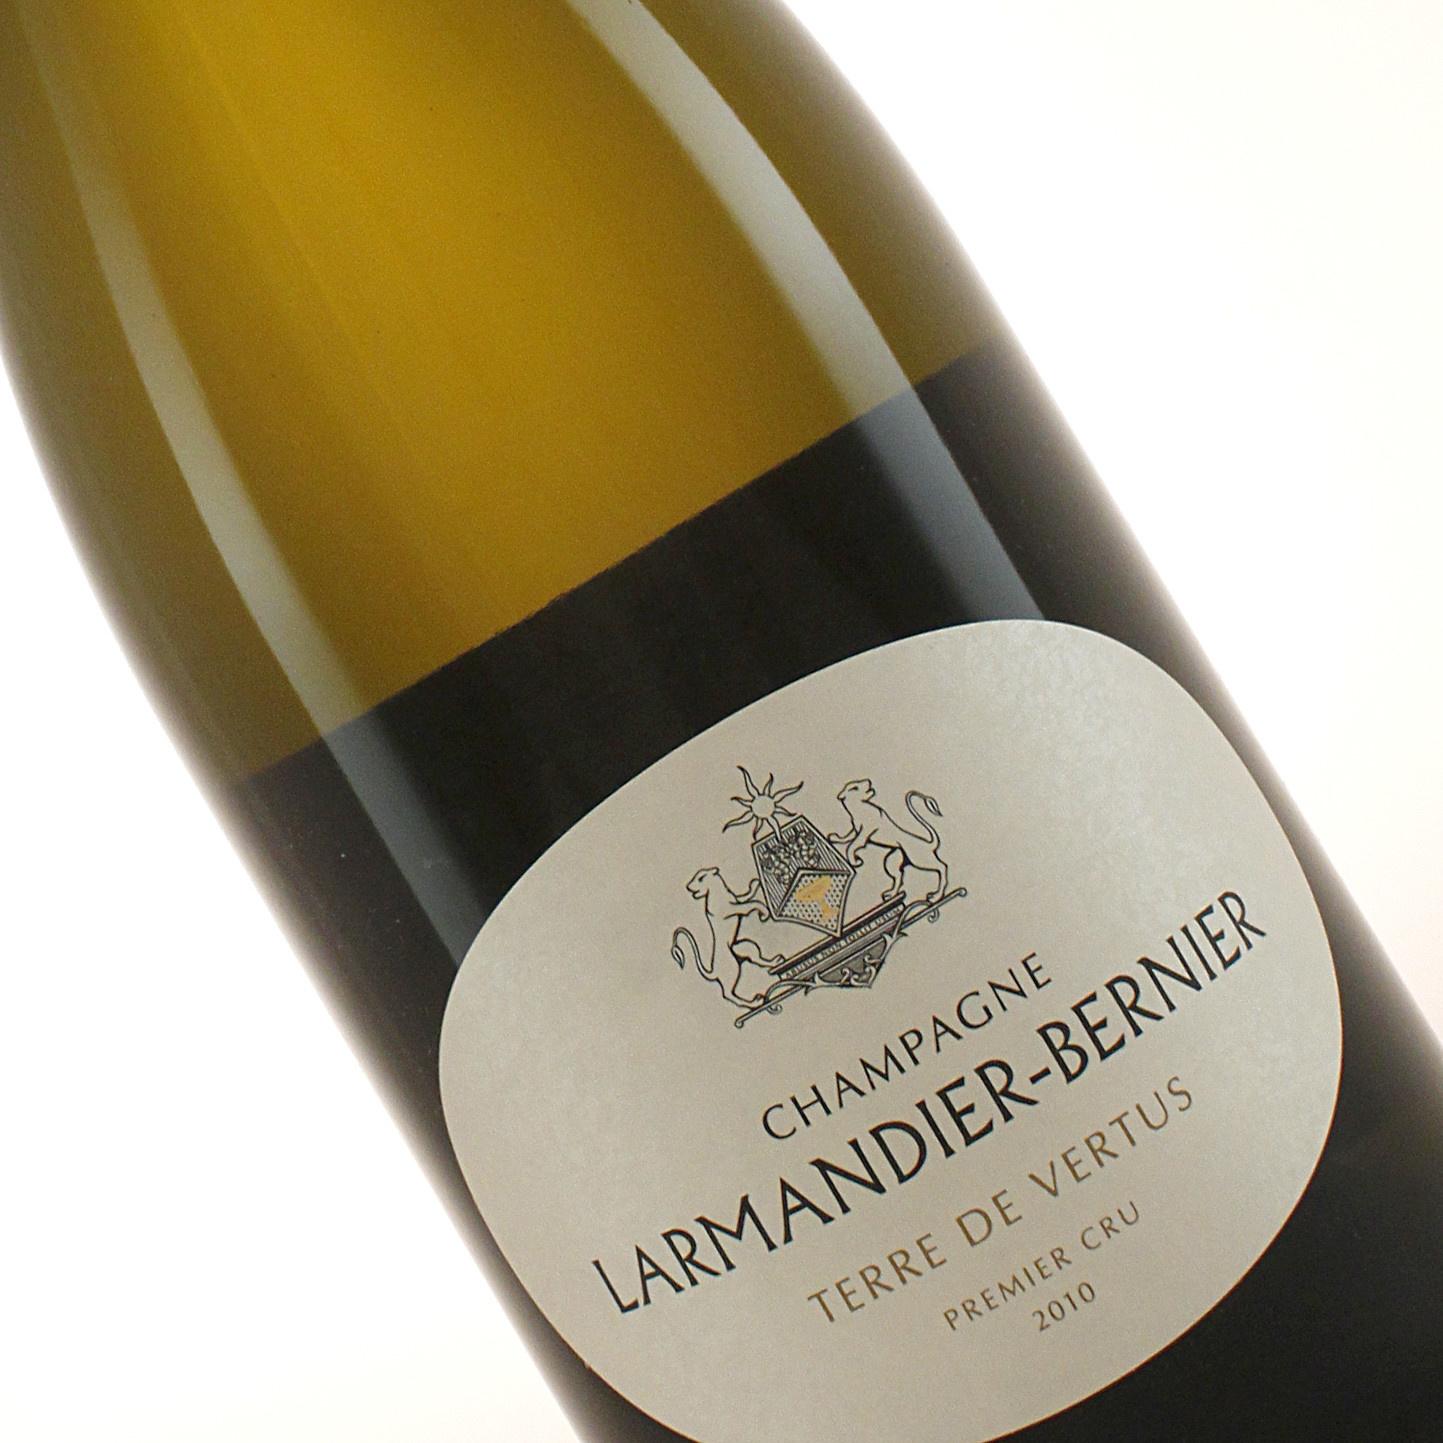 2010 Champagne Larmandier-Bernier Terre De Vertus Premier Cru